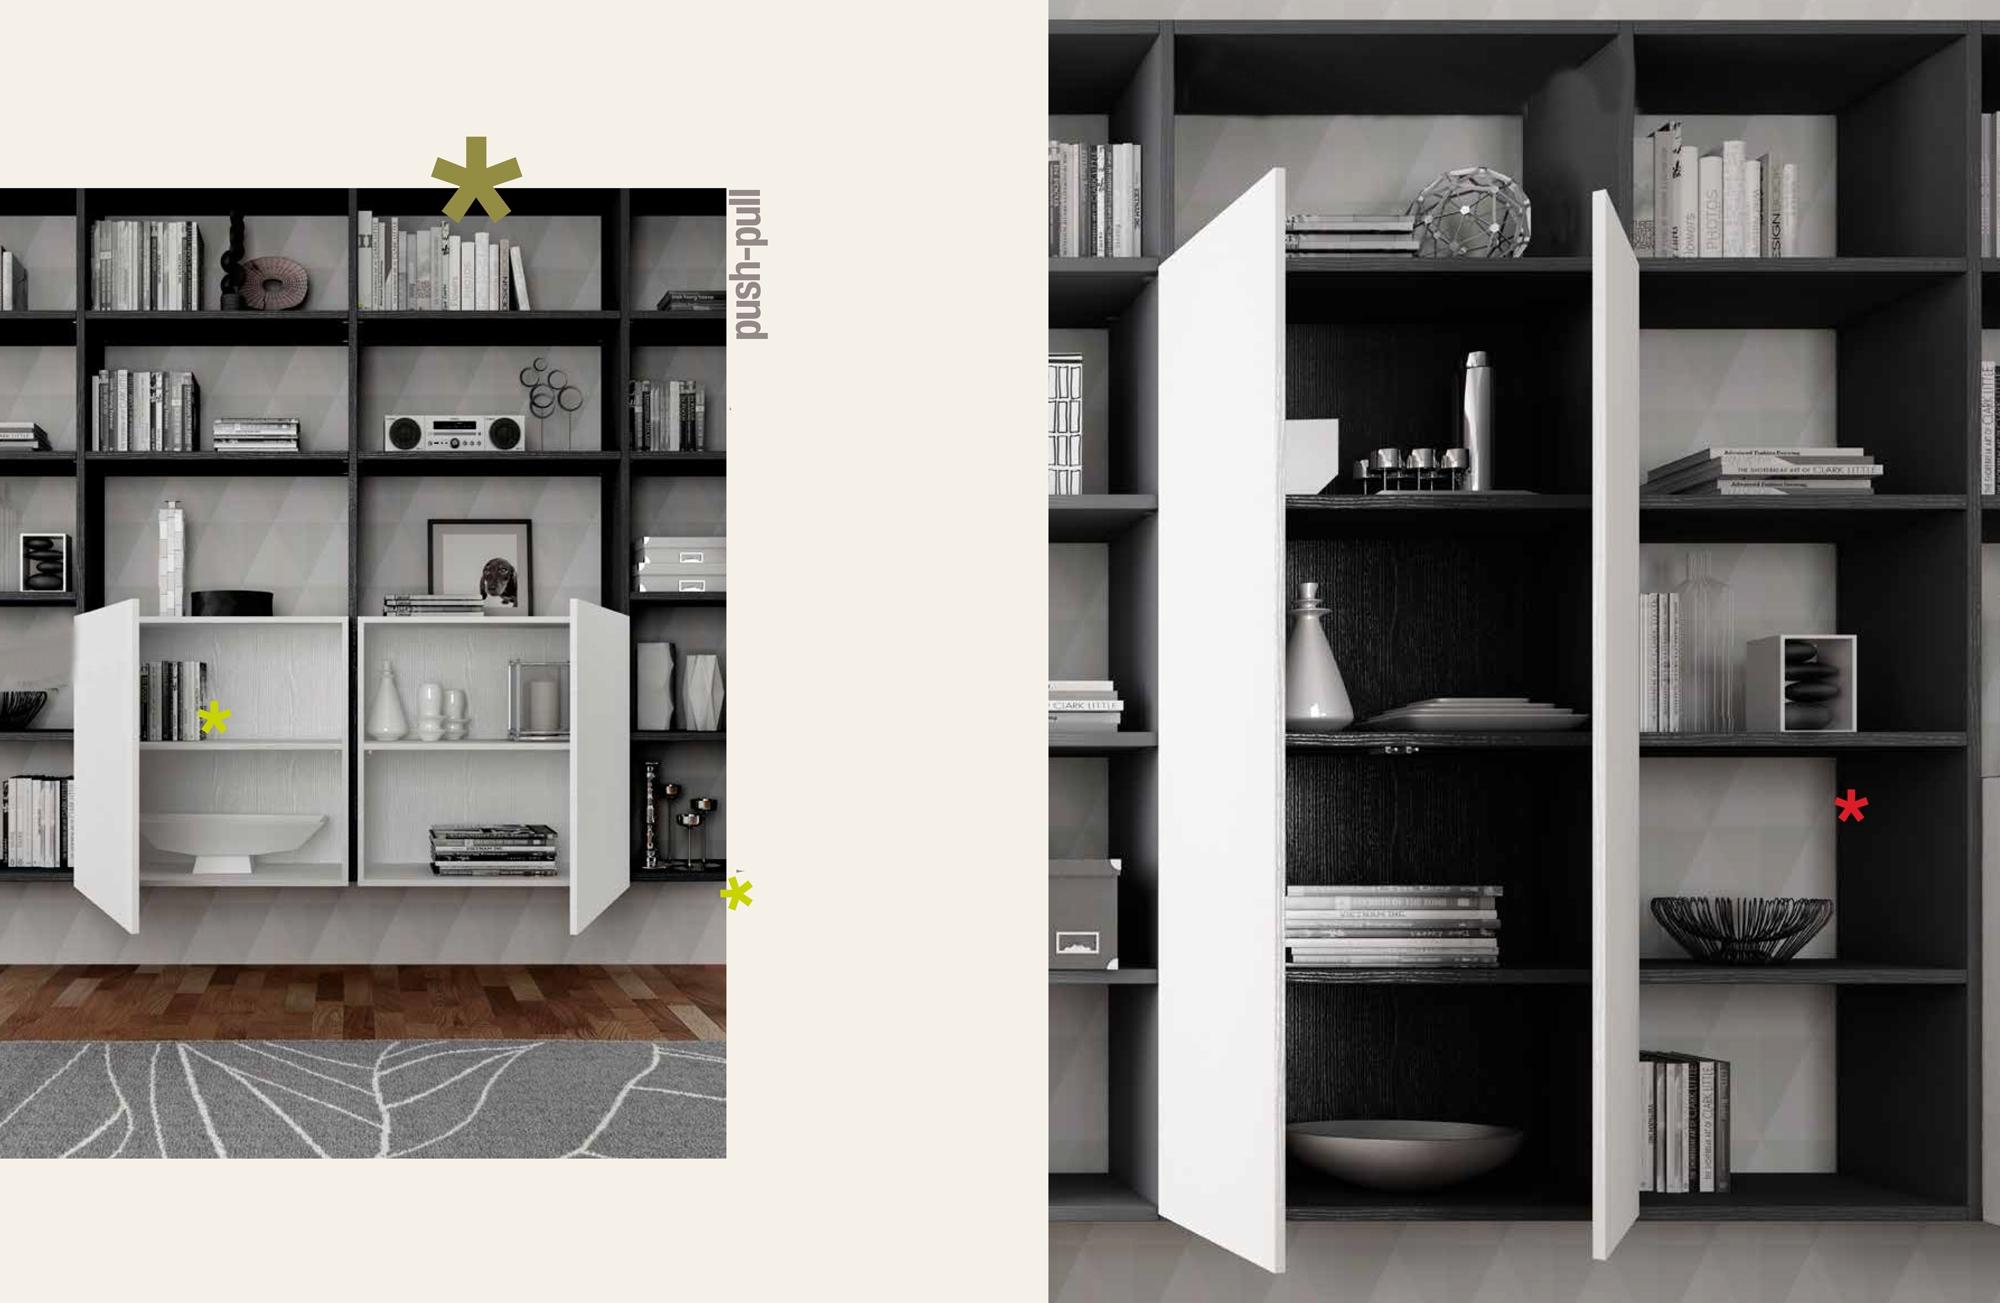 biblioth que design suspendue unique moretti compact so nuit. Black Bedroom Furniture Sets. Home Design Ideas